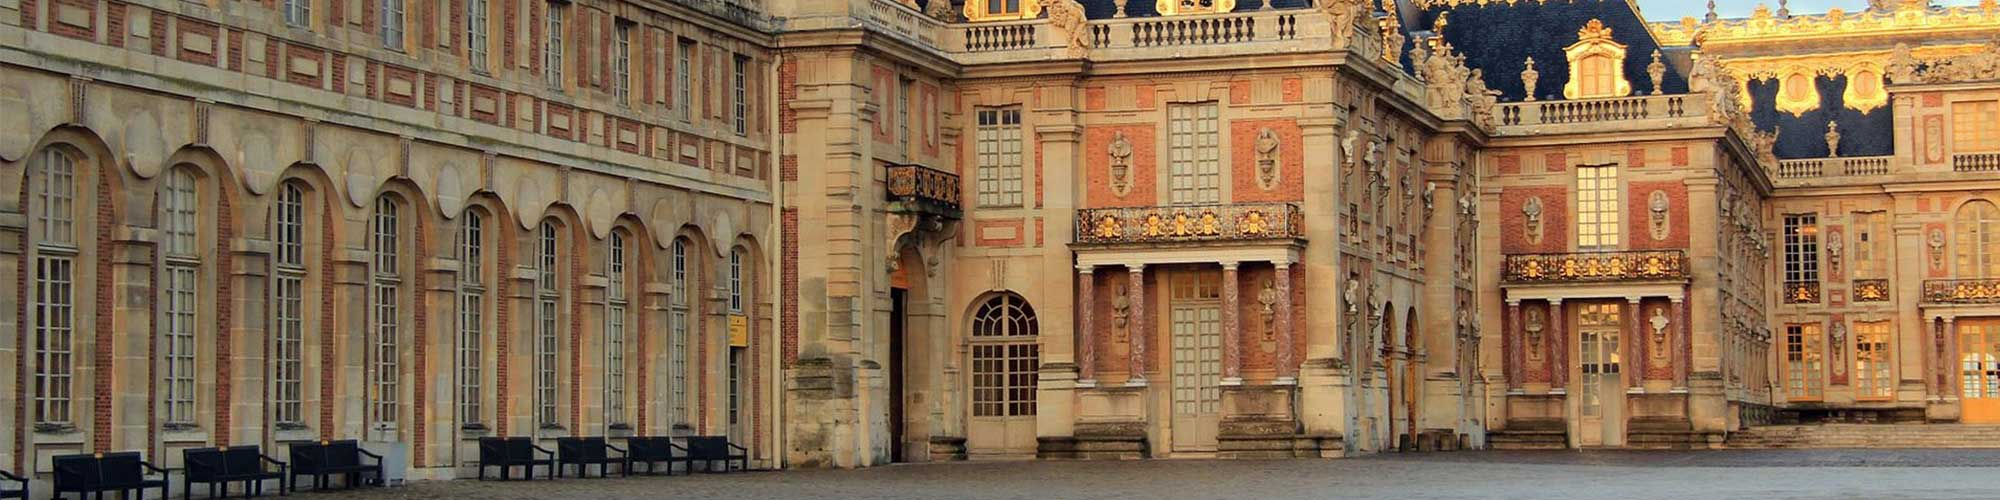 París, the grand masked ball of Versailles - El País Viajes